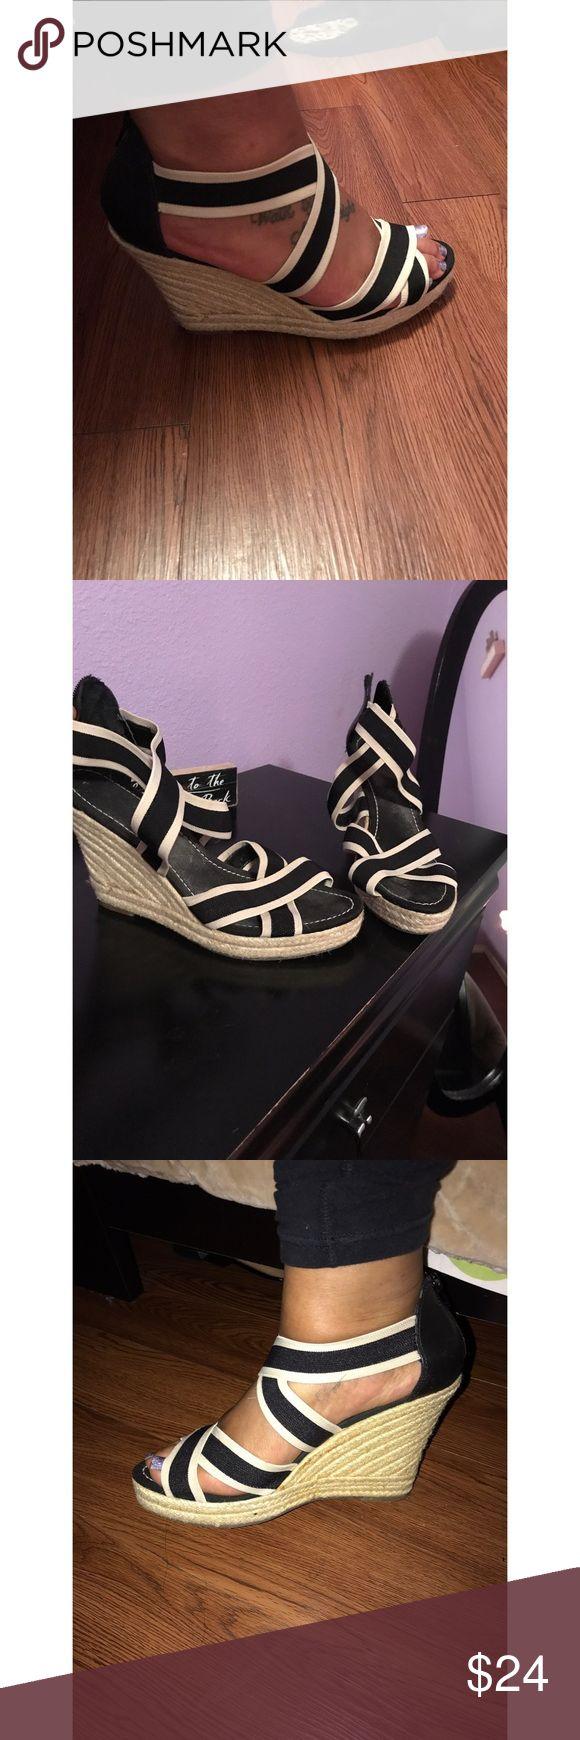 Black sandals gap - Black And White Gap Wedges